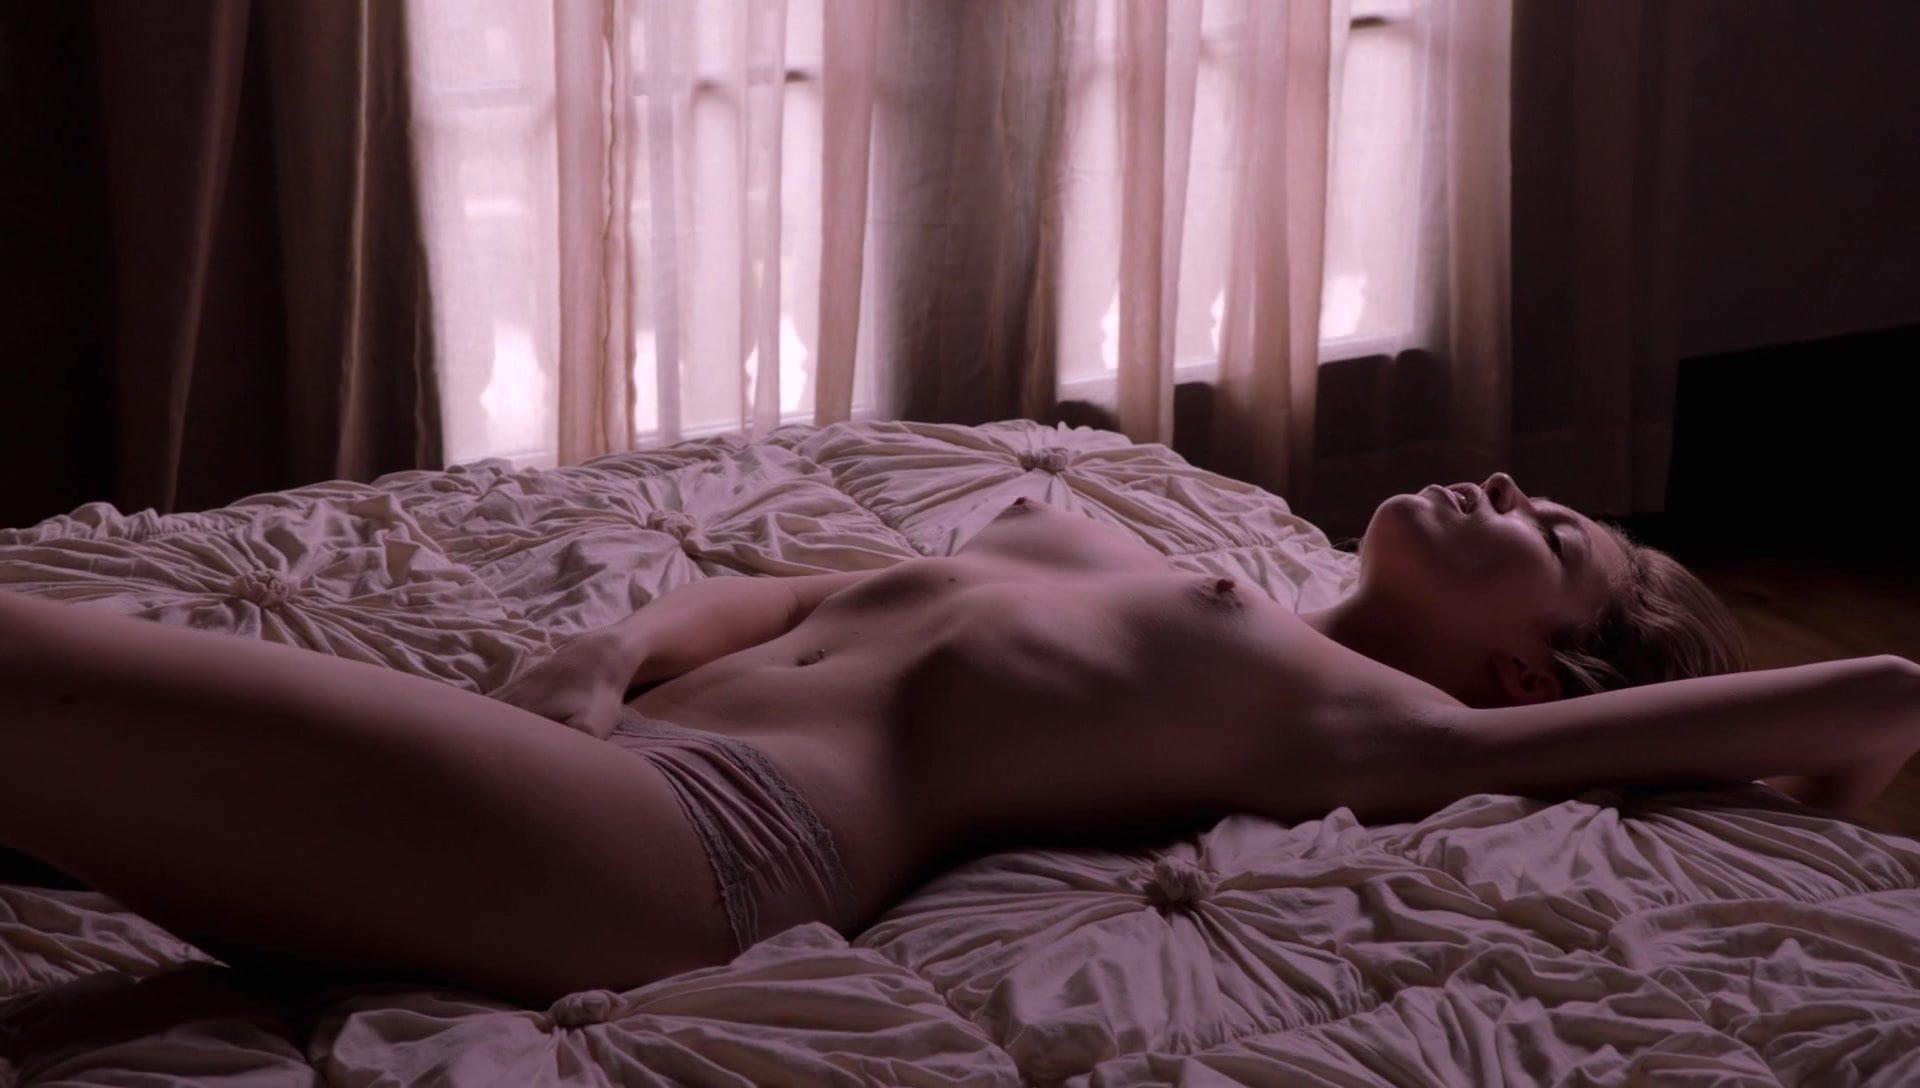 znamenitosti-v-posteli-seks-porno-meblirovannuyu-ebut-v-tri-dirki